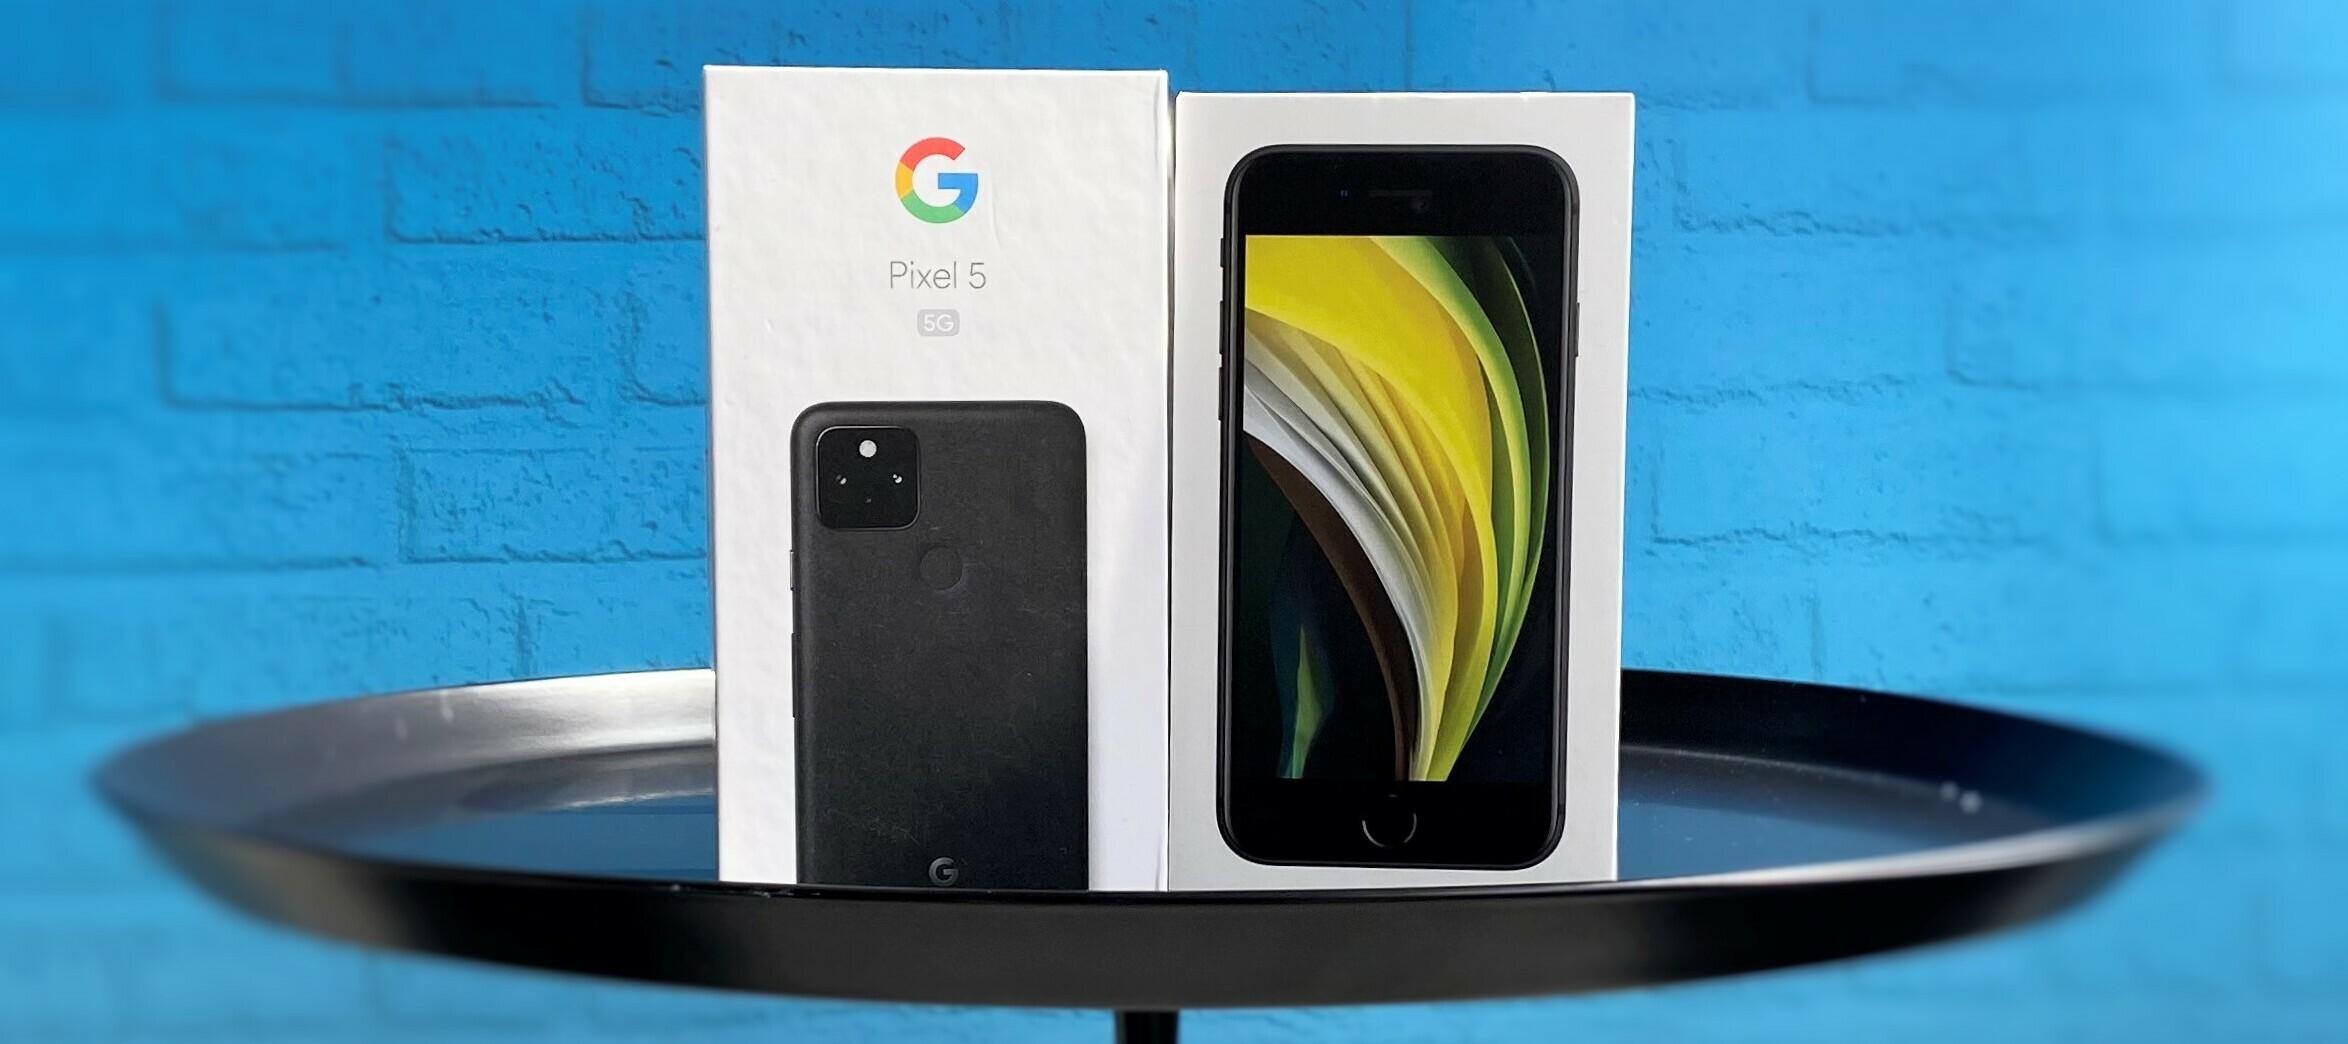 Google Pixel 5 5G vs. Apple iPhone SE - mach mit uns den Kameravergleich!